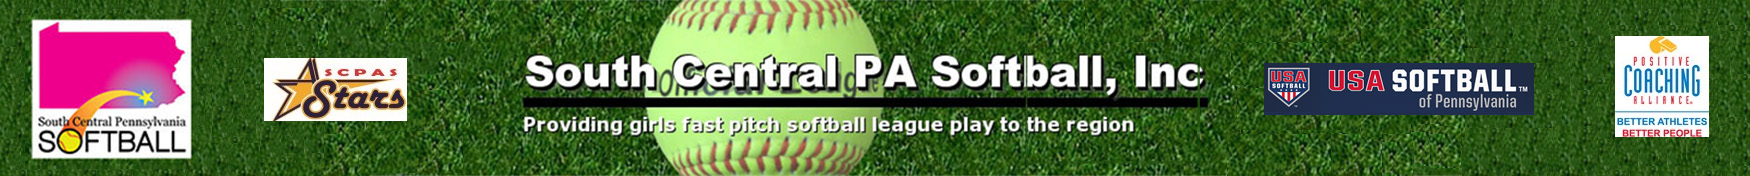 South Central PA Softball, Inc, Softball, Run, Field